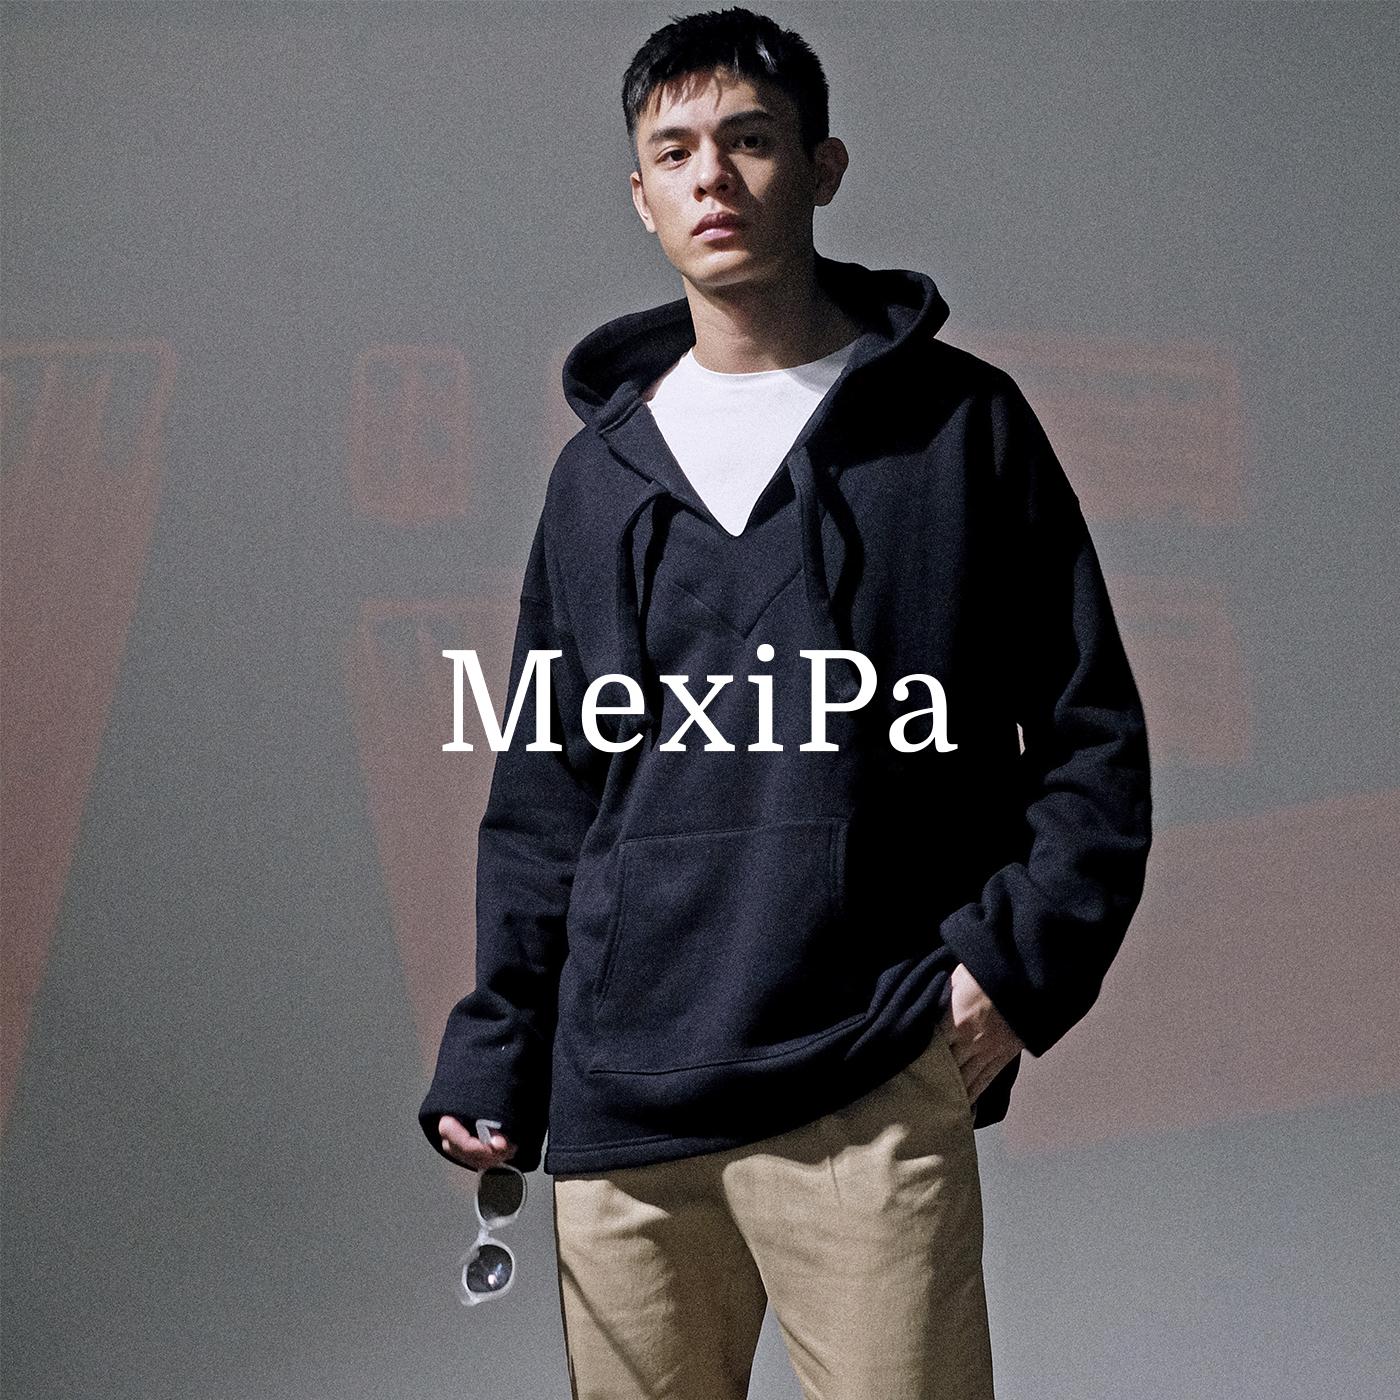 MEXIPA,メキパ,墨西哥帽t,Baja hoodie,墨西哥衫,Baja jacket,墨西哥外套